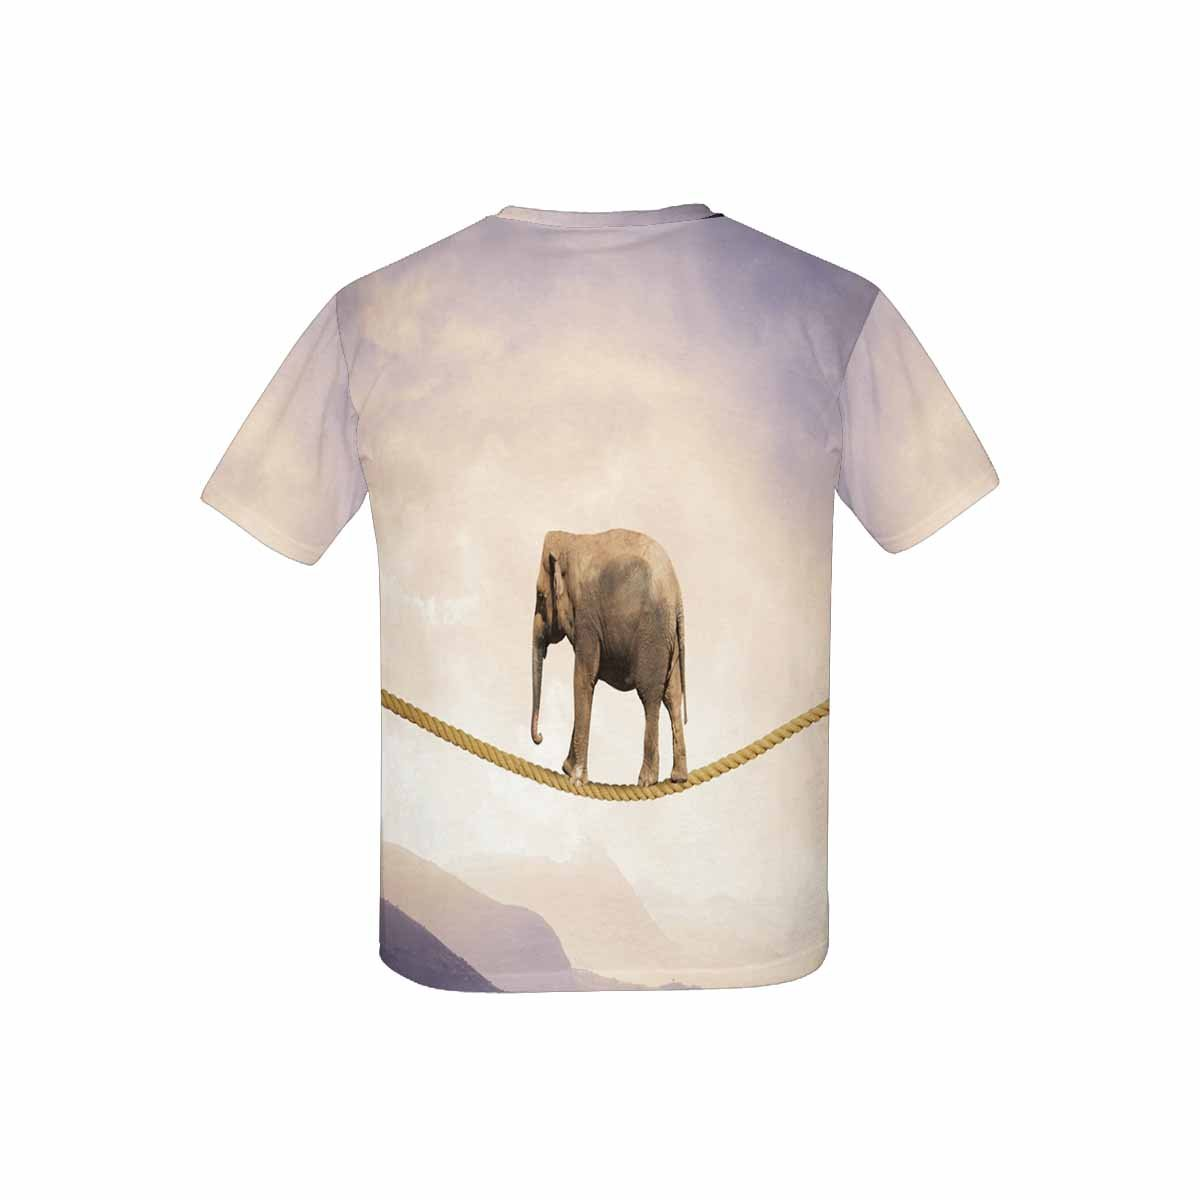 XS-XL INTERESTPRINT Elephant on Rope Youth T-Shirts